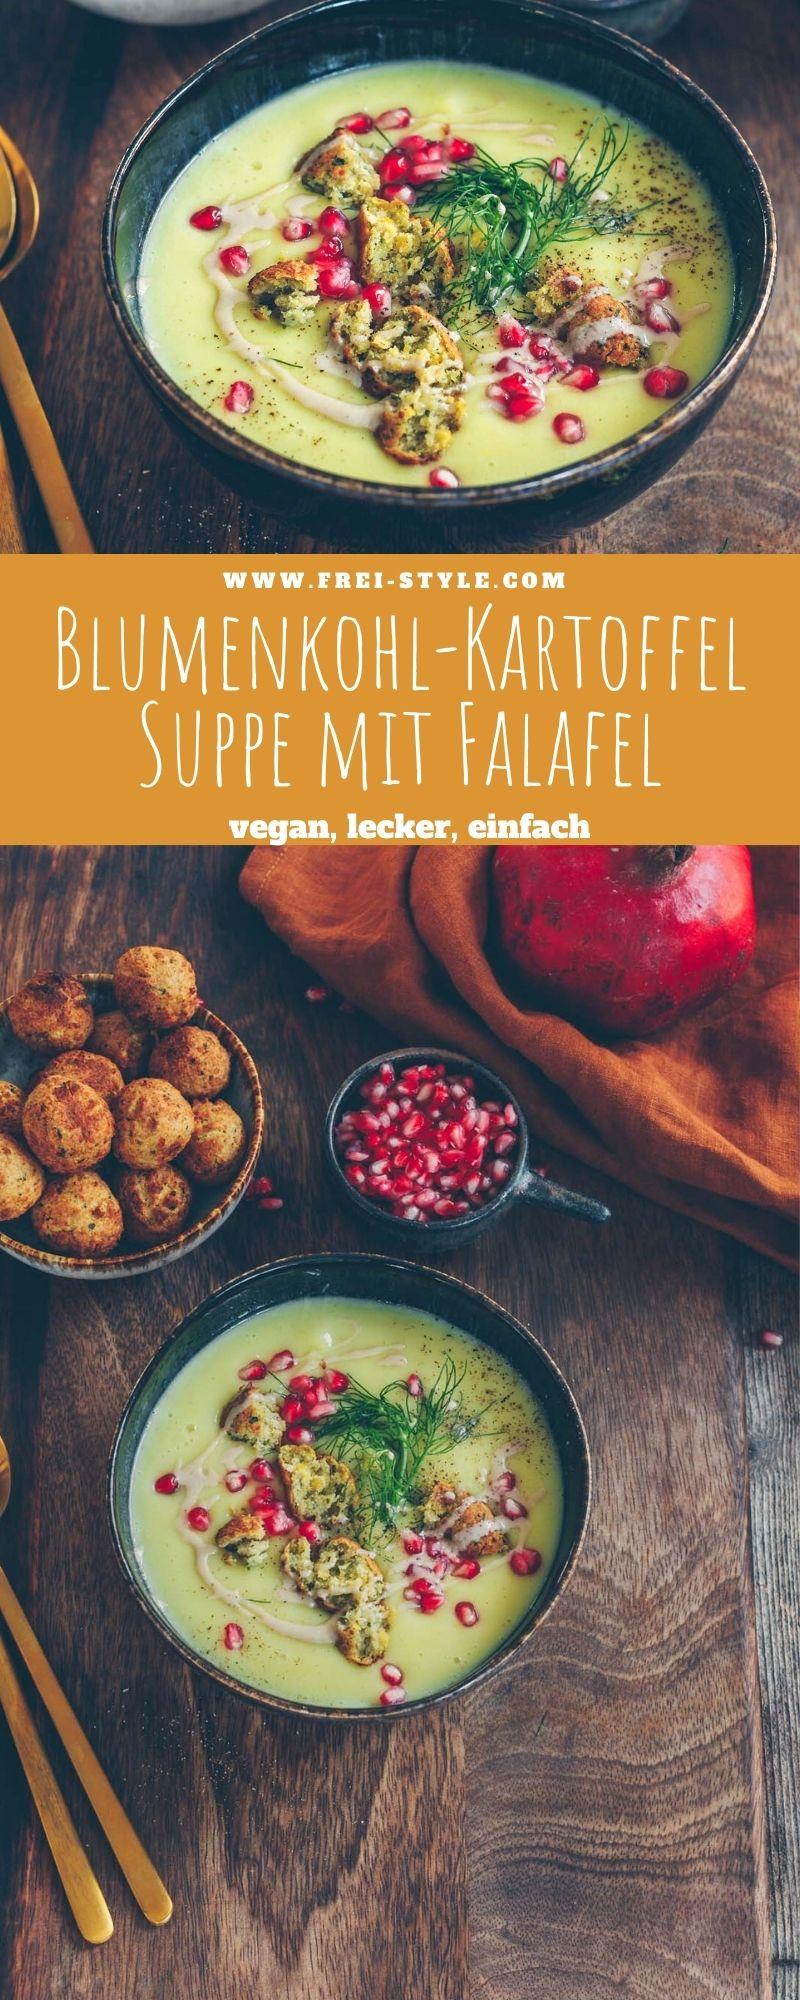 Blumenkohl-Kartoffel Suppe mit Falafel